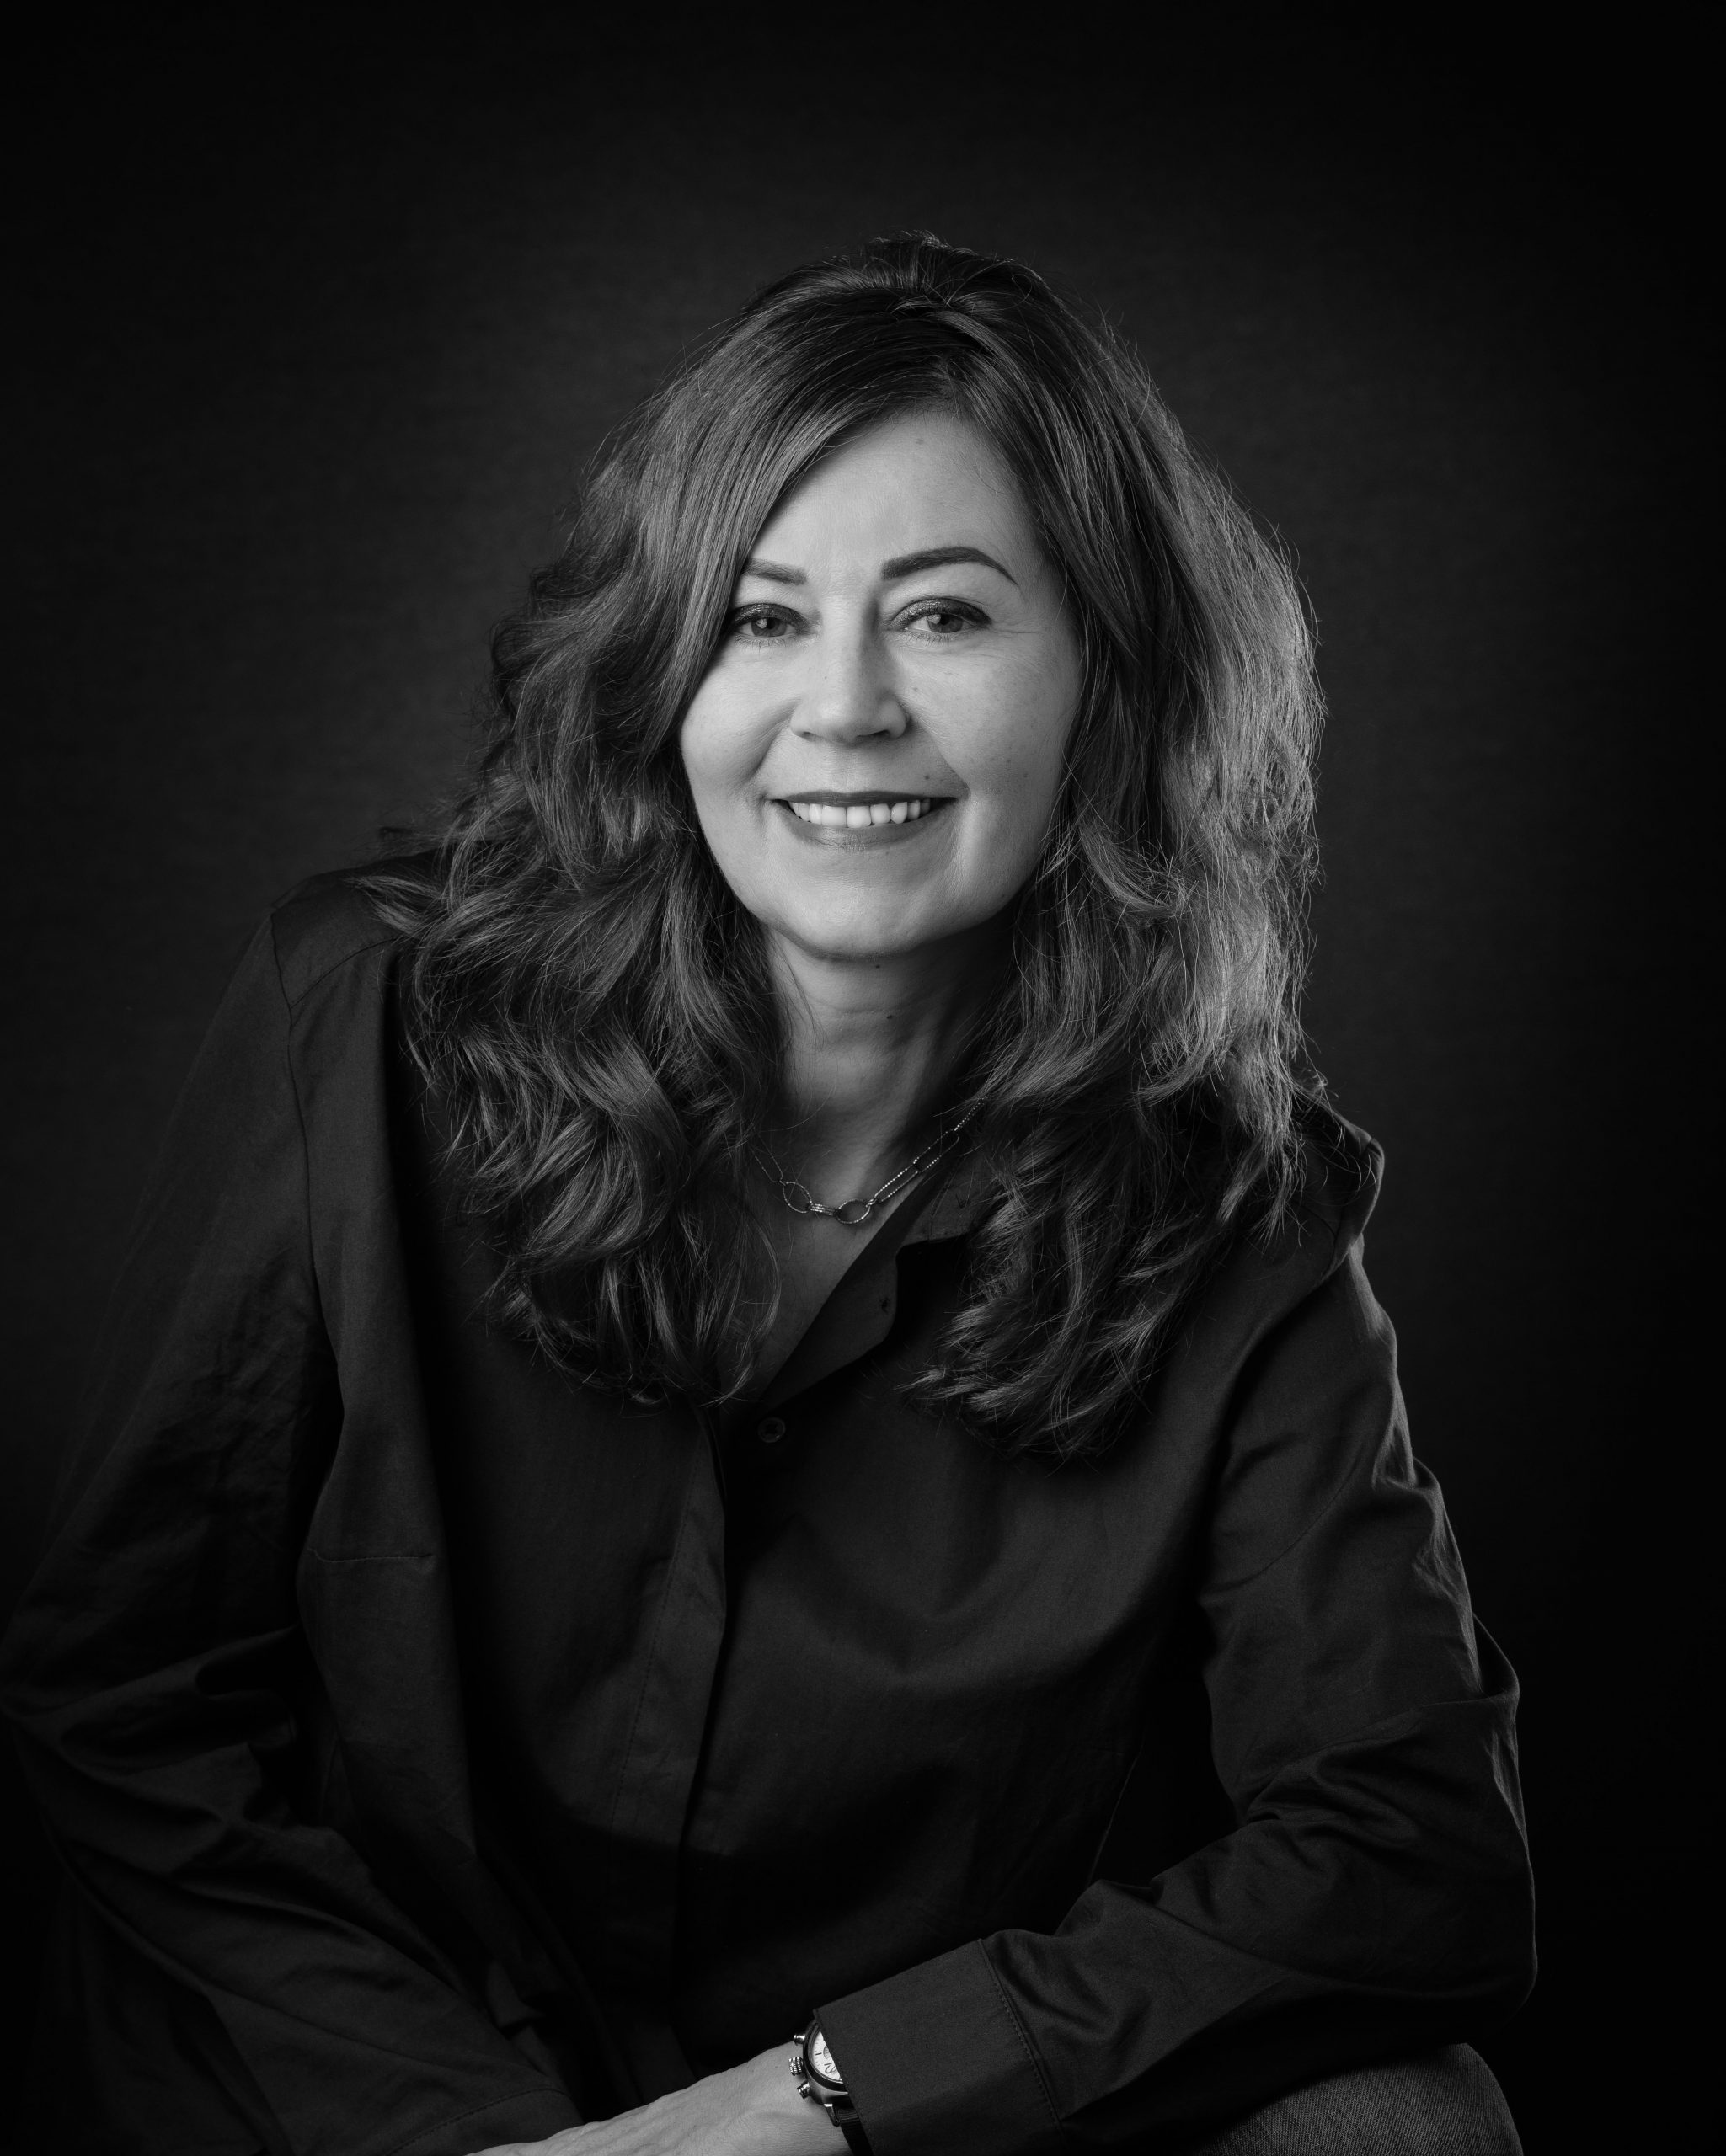 Anne-Marie Giorgi